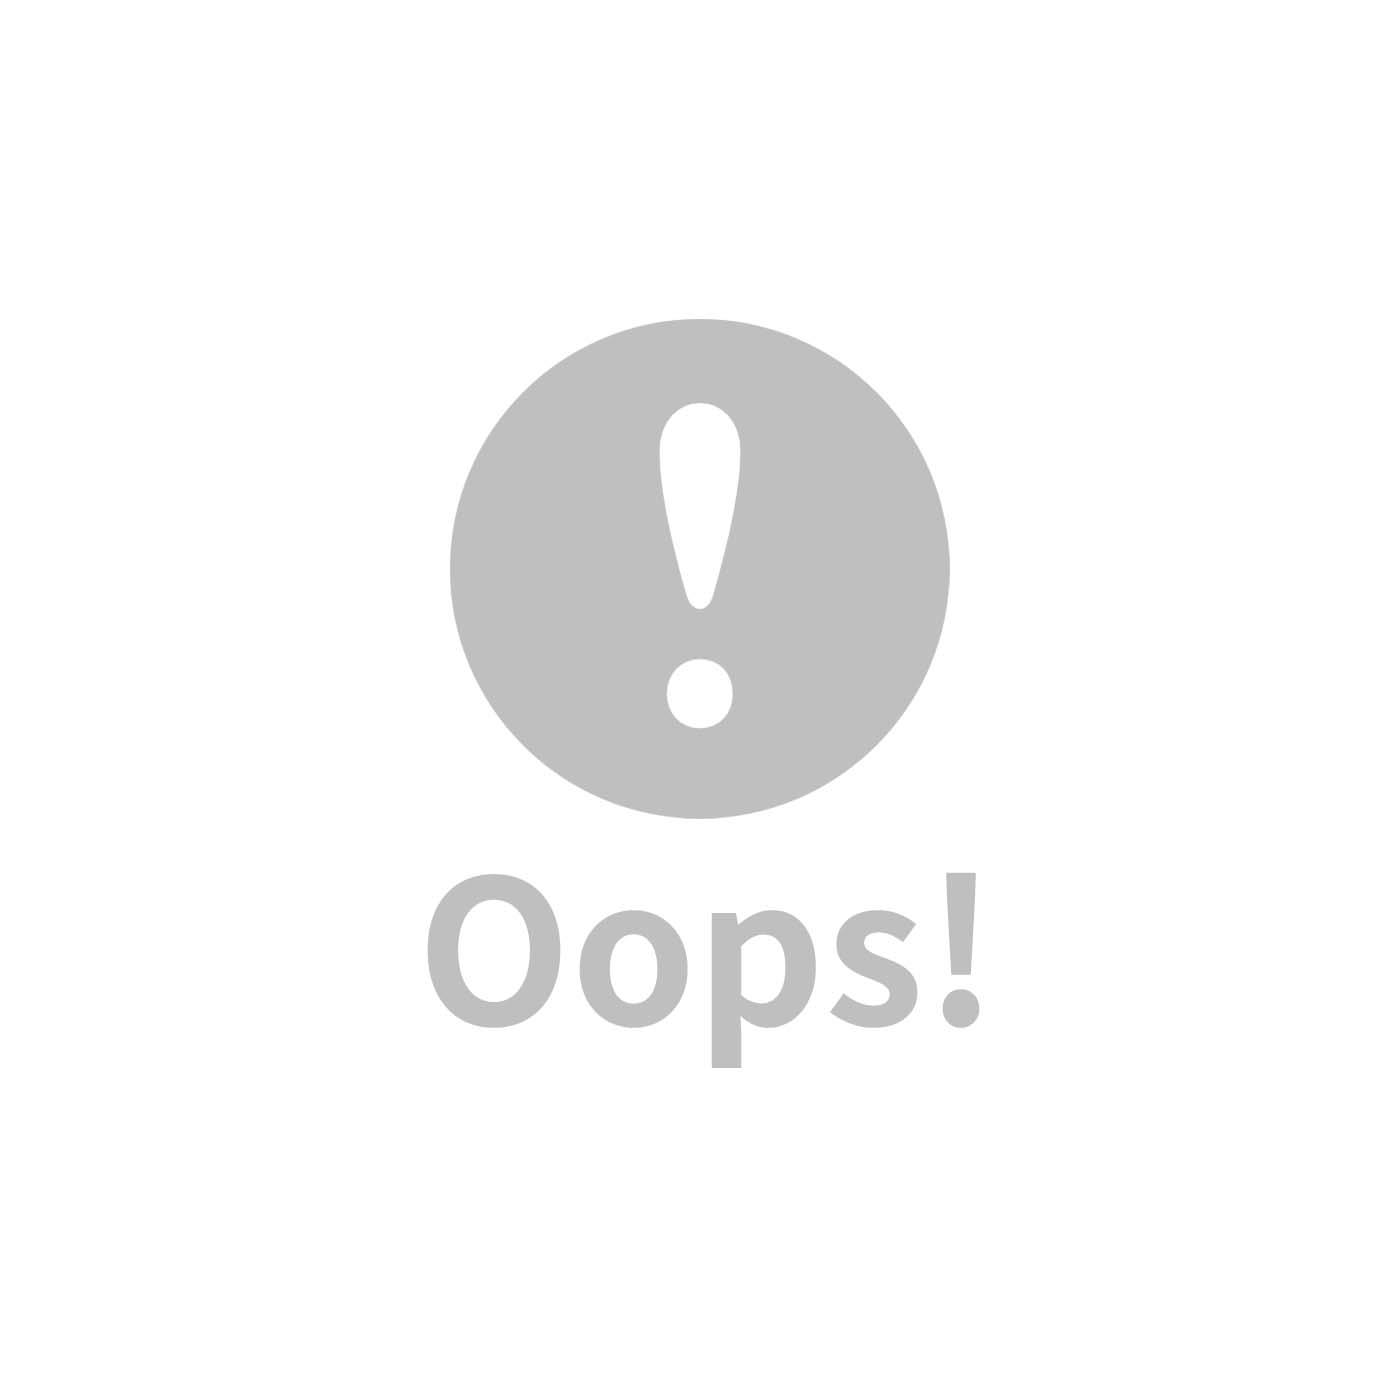 Kinderspel 抗UV‧防曬遮陽童帽 (粉紅棒棒糖)